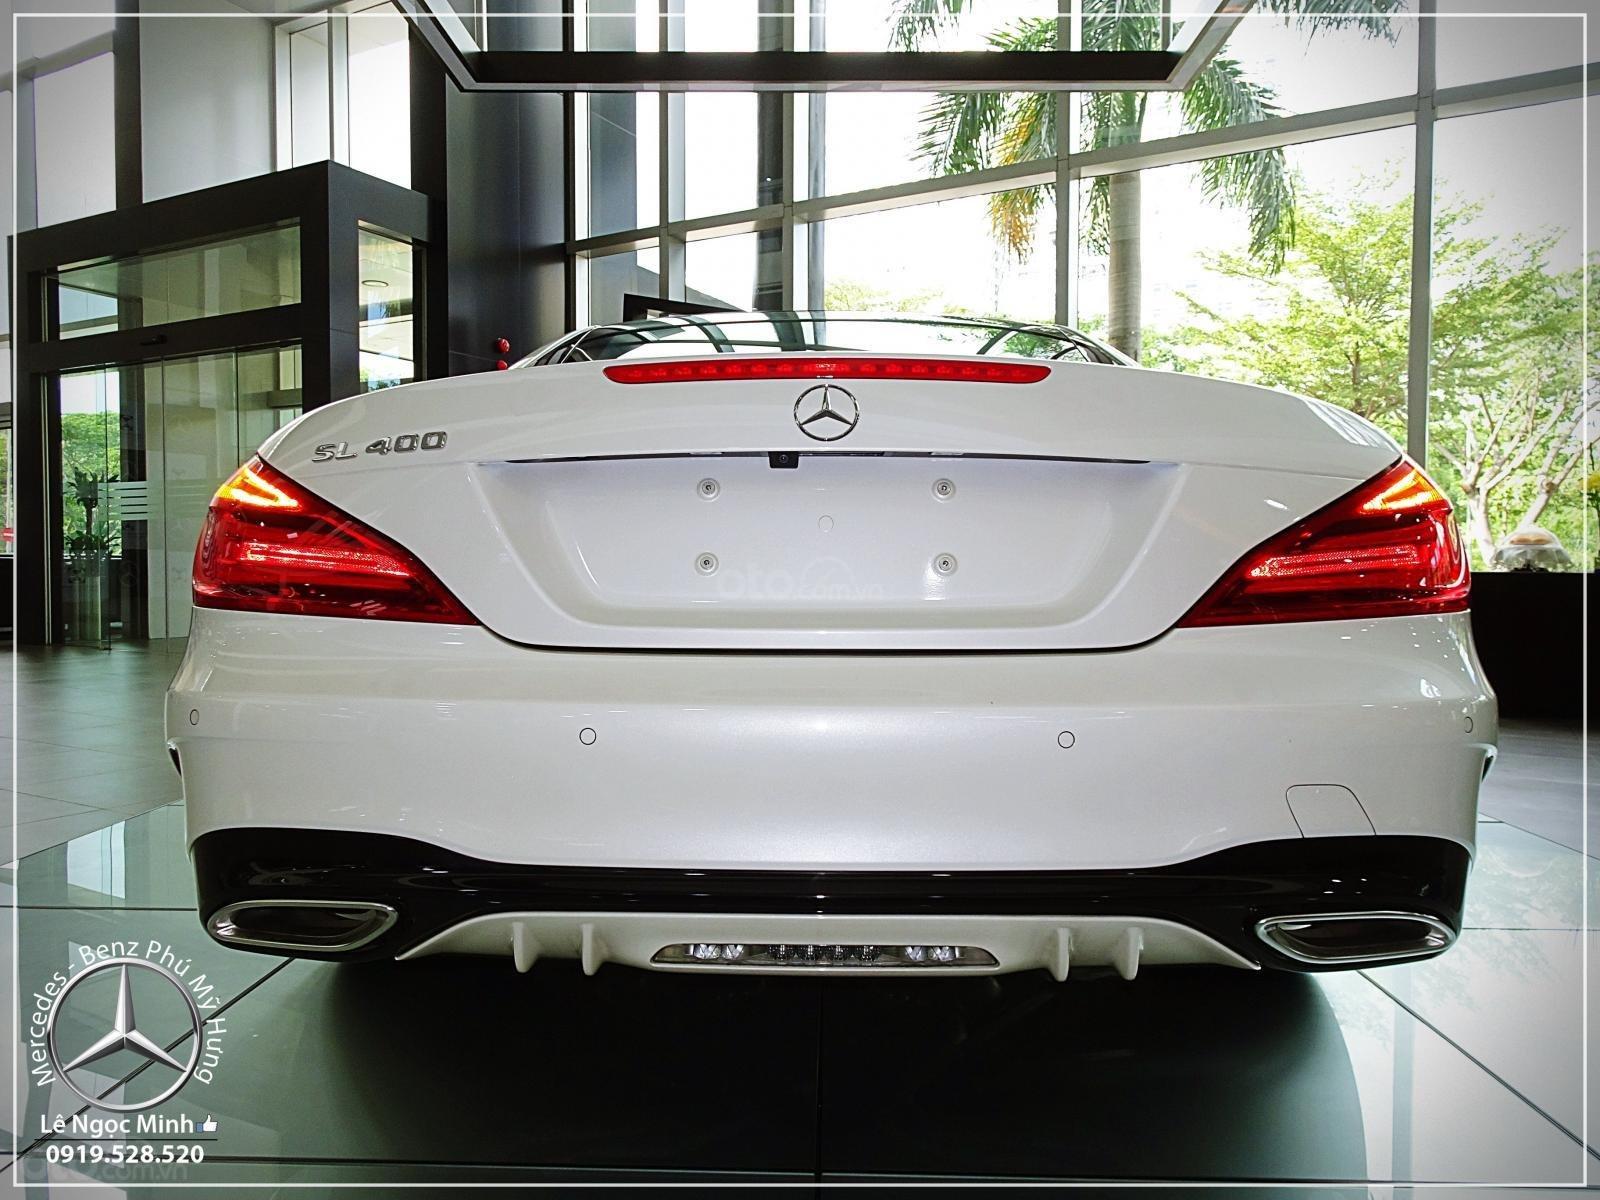 Mercedes-Benz SL 400 model 2020 - Xe thể thao mui trần 2 cửa- LH Đặt xe: 0919 528 520 - hỗ trợ Bank 80% (7)